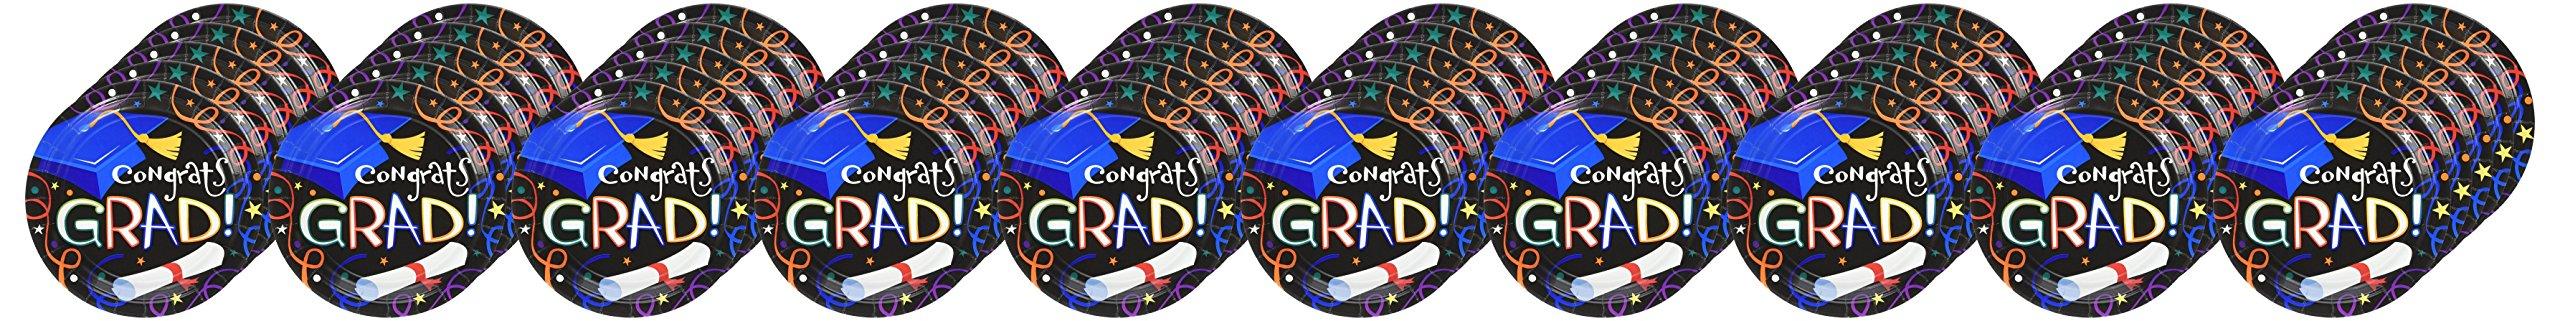 Grad Celebration Dessert Plates, 50ct by Party America (Image #1)